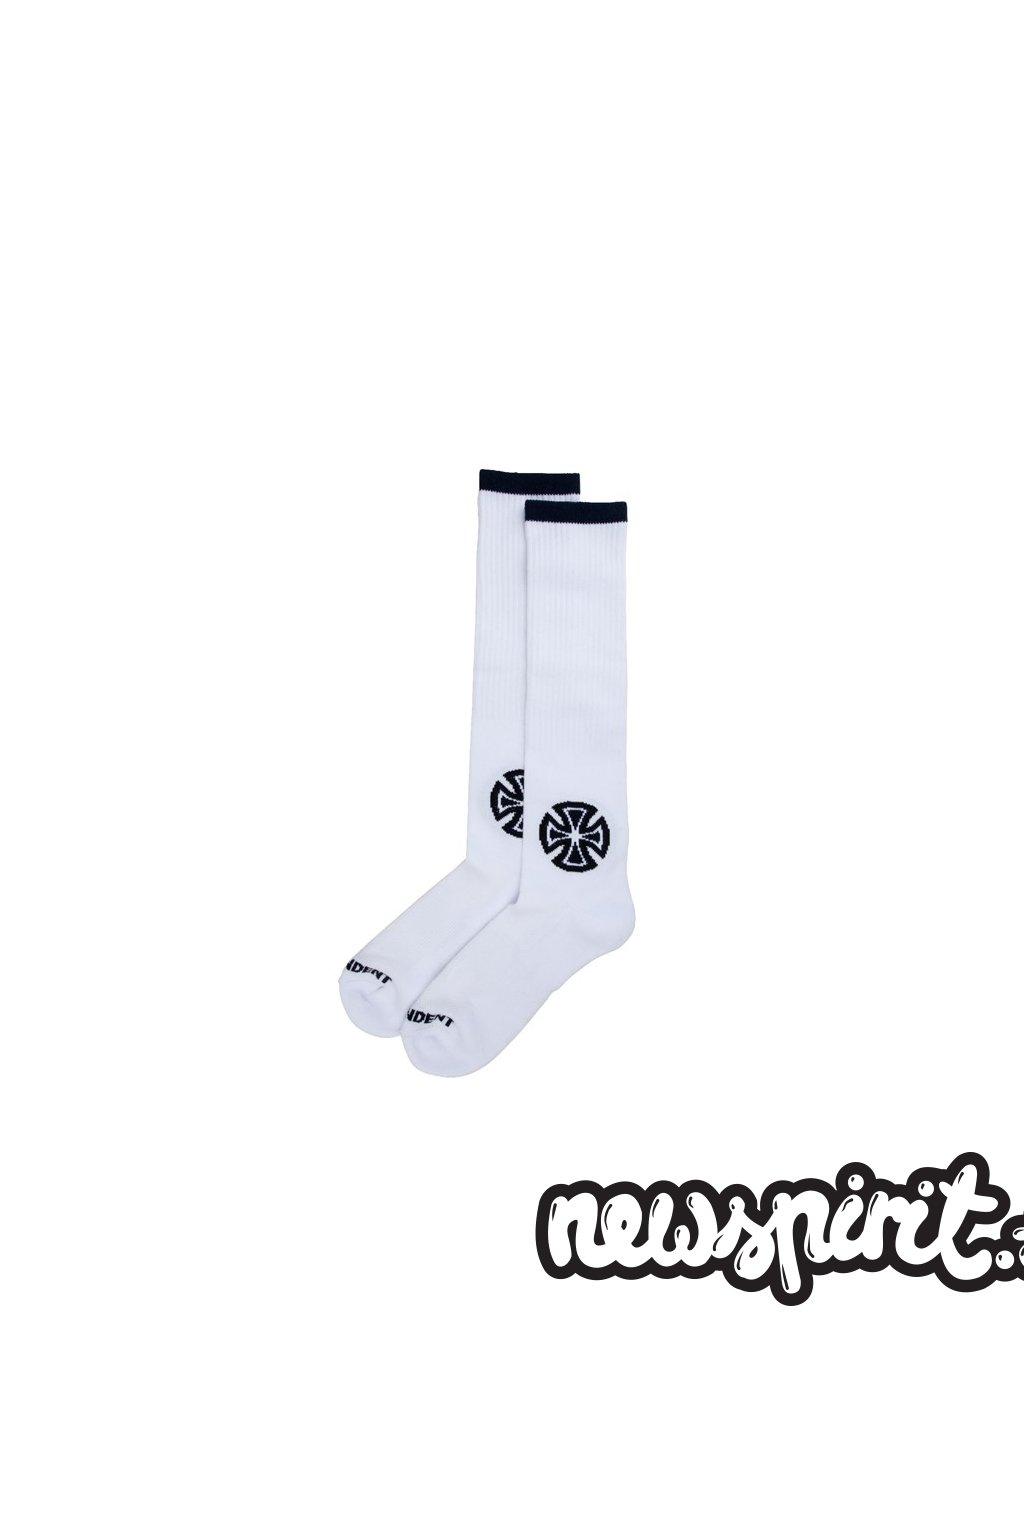 INA SP19 ACCS Socks Primary BC White